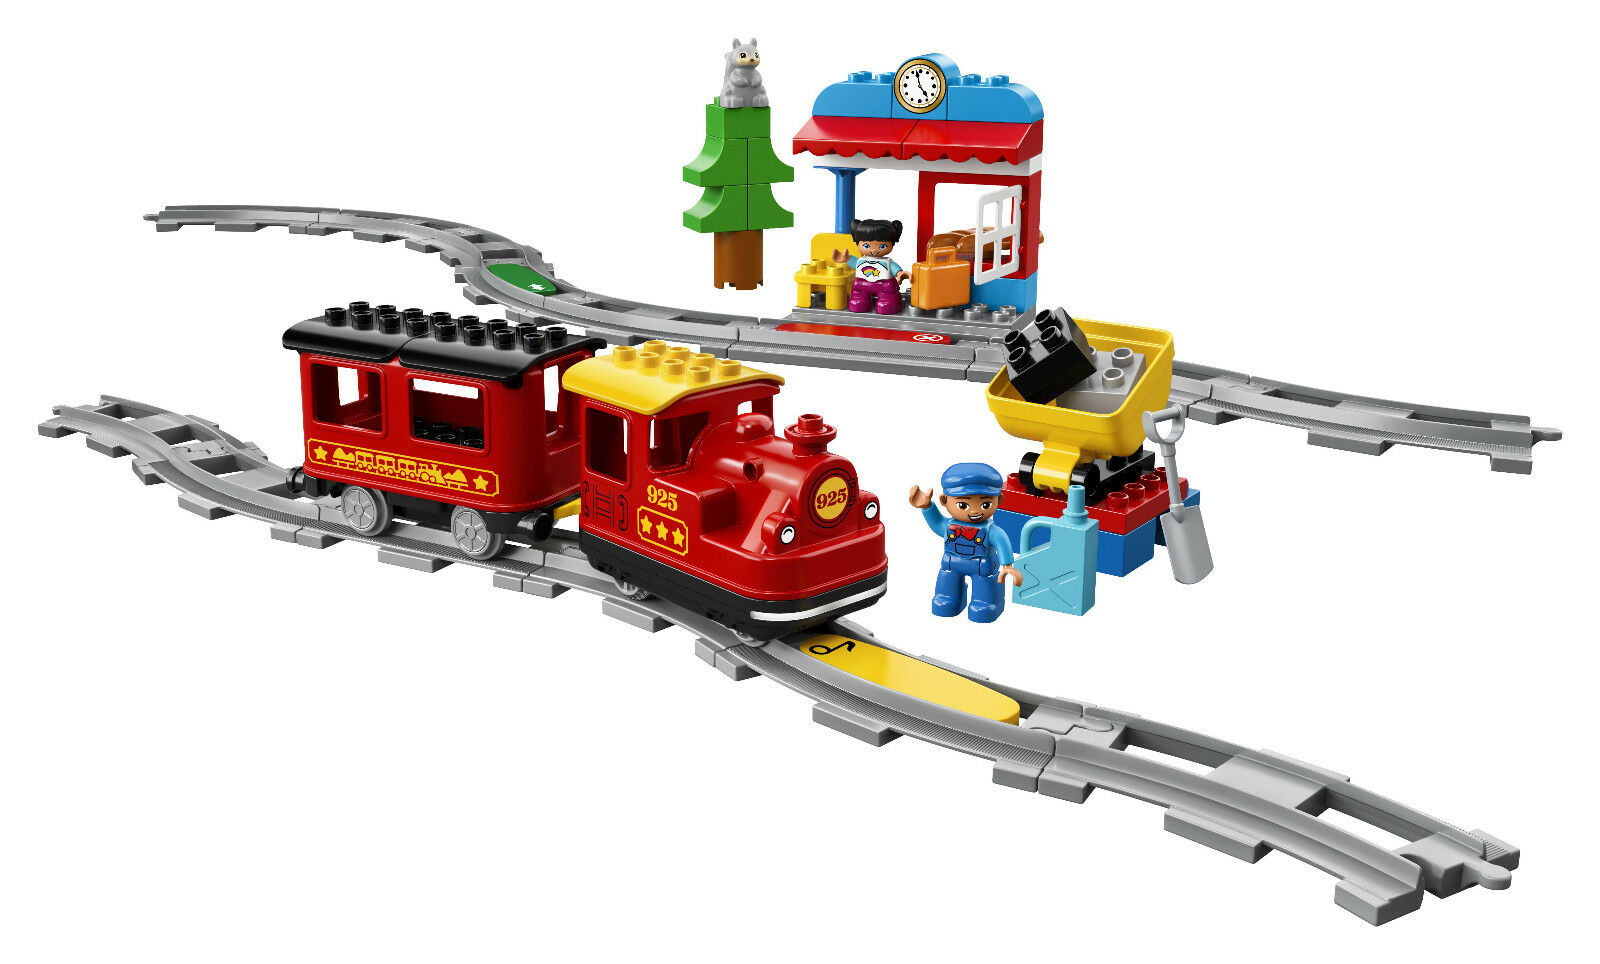 Lego Duplo 10874 - Dampfeisenbahn, Dampfeisenbahn, Dampfeisenbahn, Neuf  Embal. Origine 87f21f